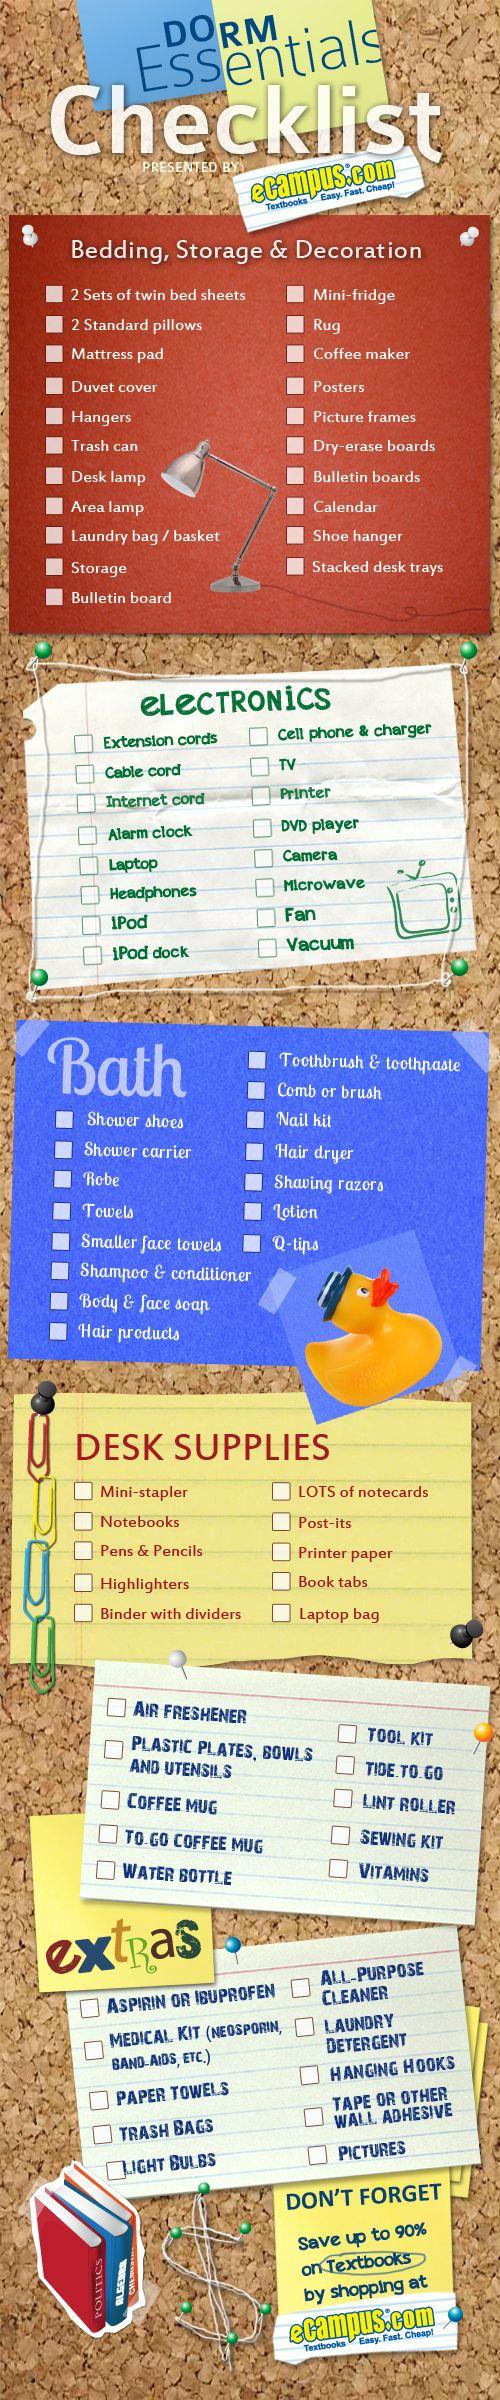 List Of 10 Dorm Room Essentials & Checklist | A Mitten Full of Savings